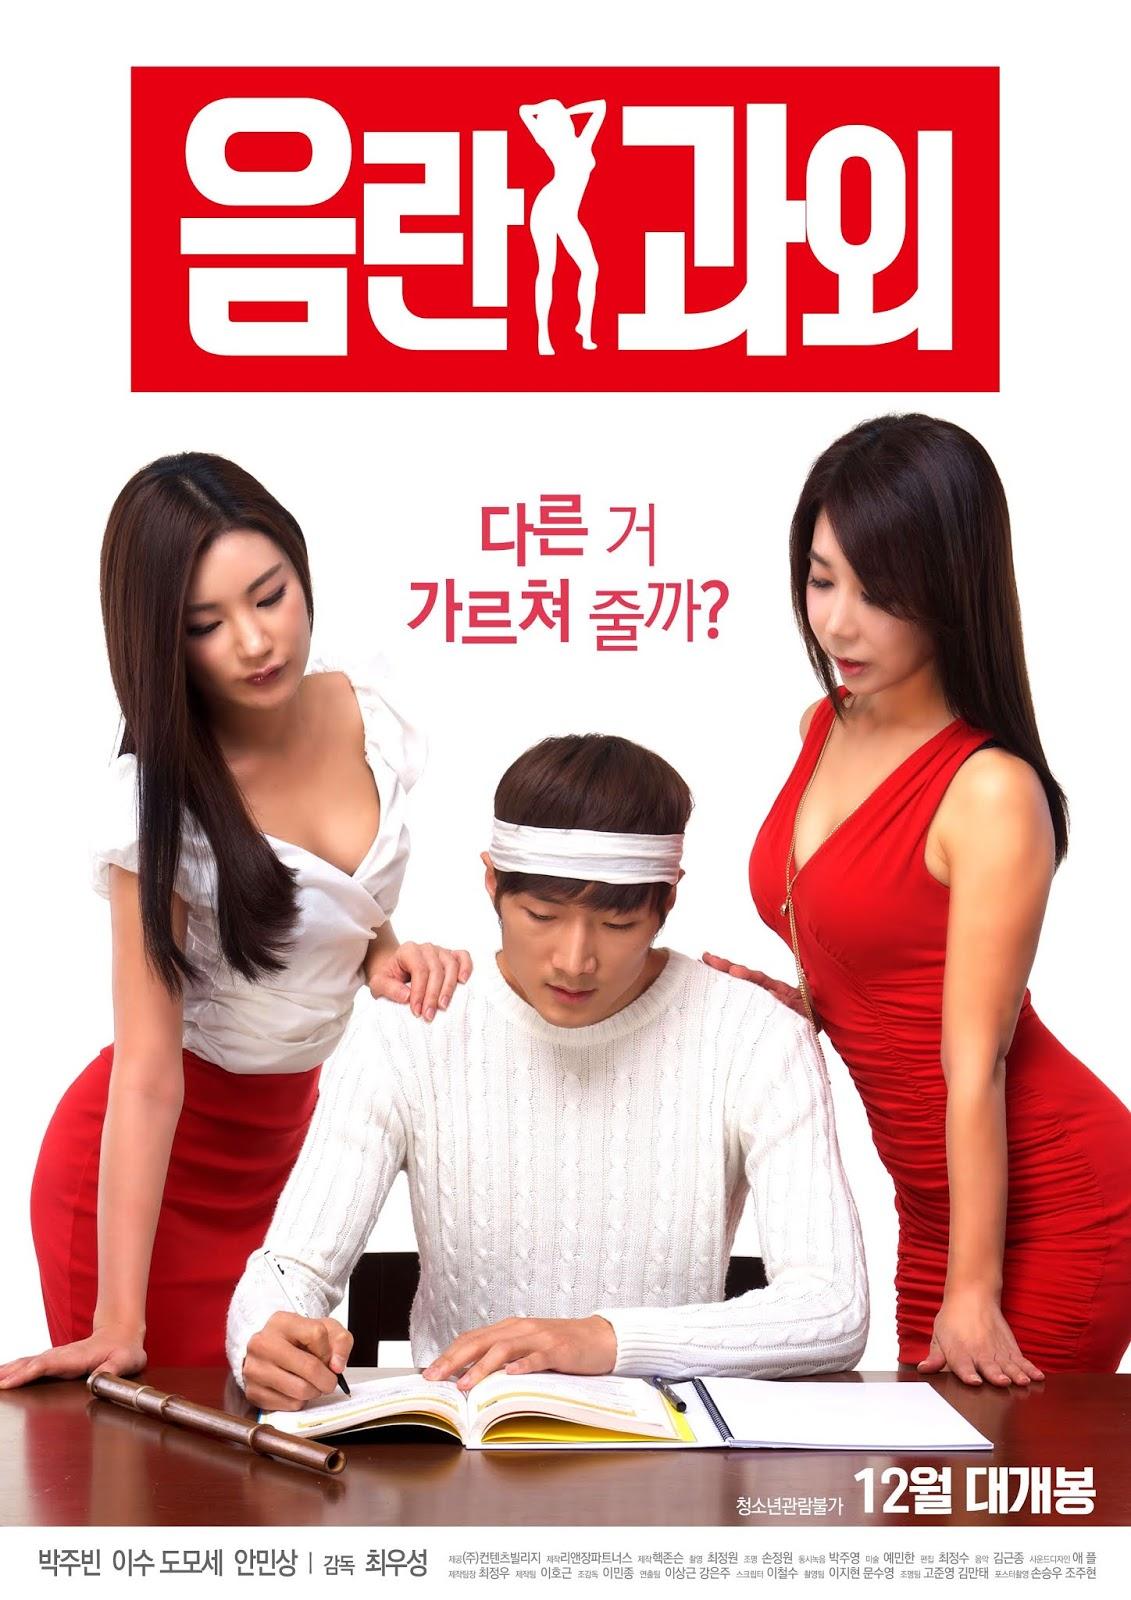 Erotic Tutoring 3 Full Korea 18+ Adult Movie Online Free